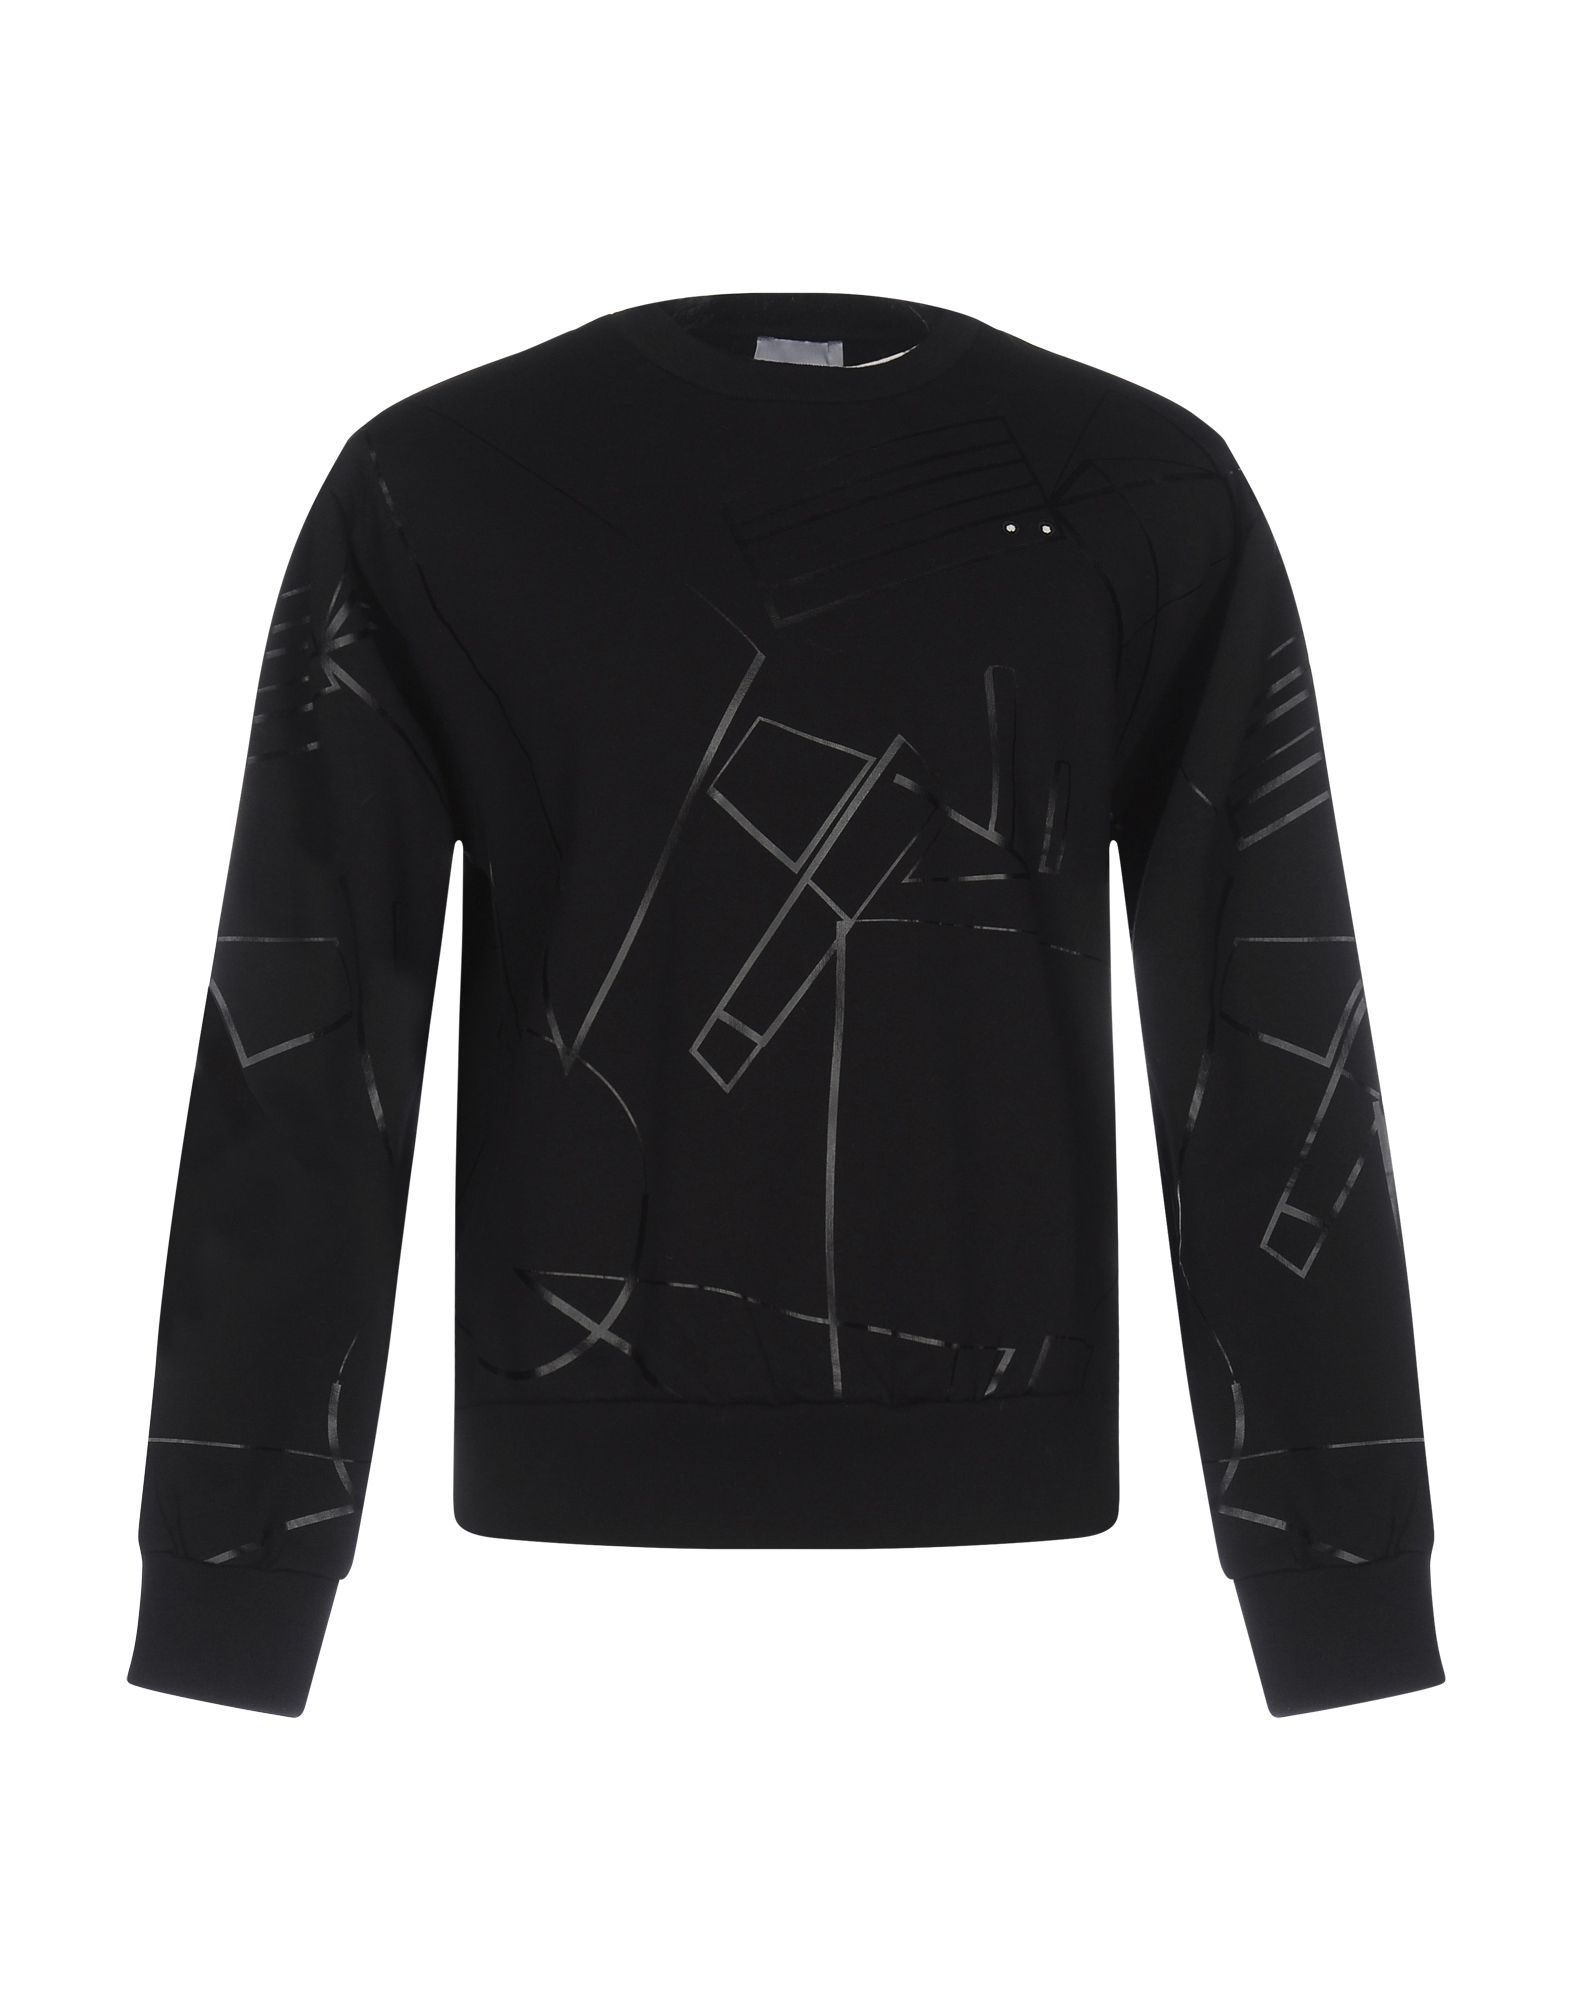 ONE T SHIRT Толстовка one pocket color block plaid shirt collar long sleeves slimming shirt for men